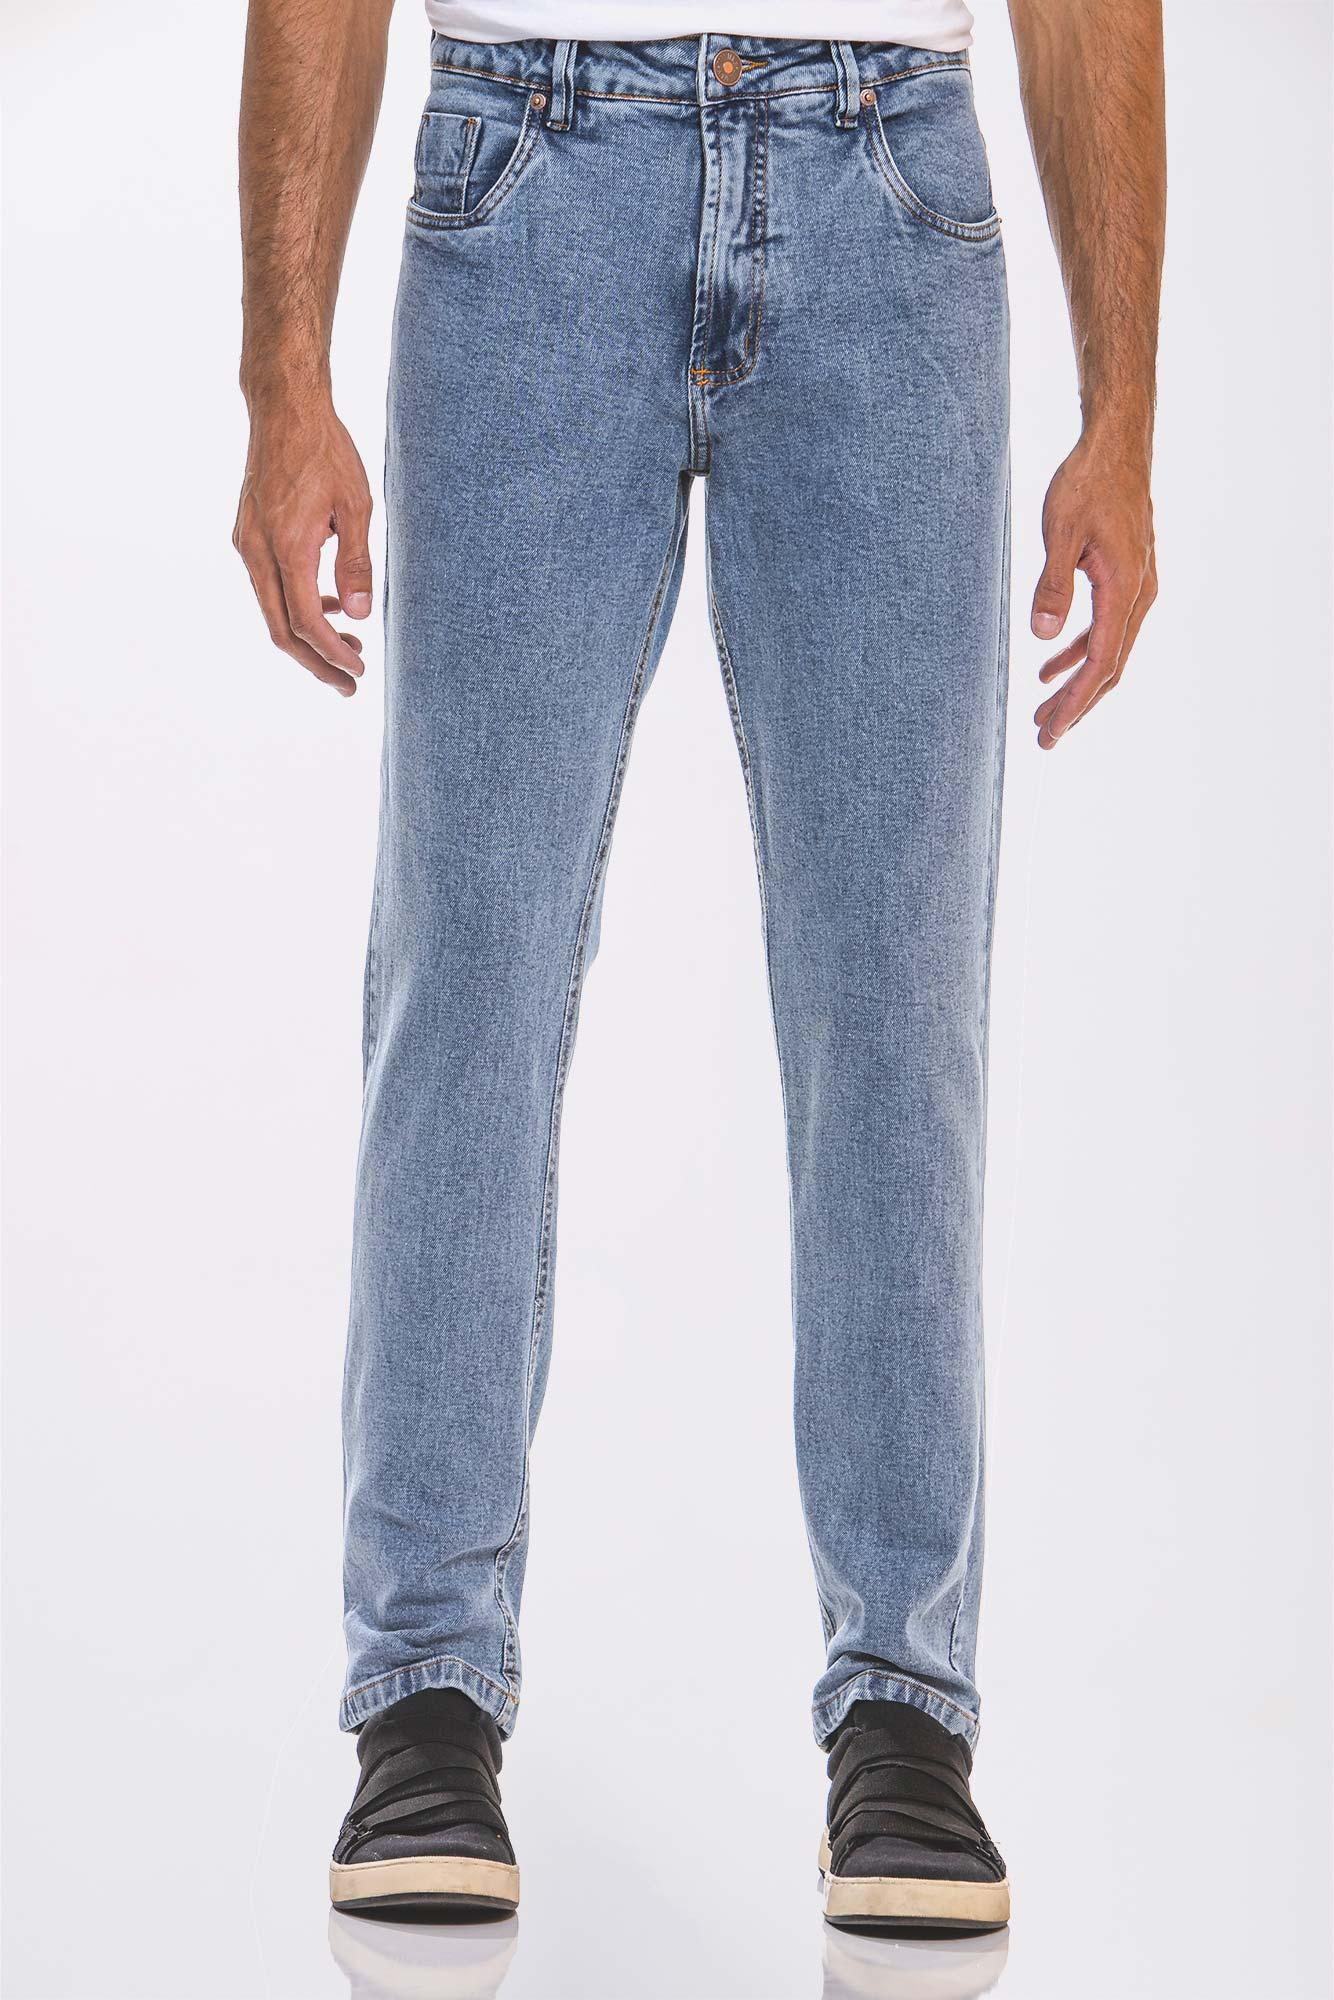 Calça Jeans New Deep